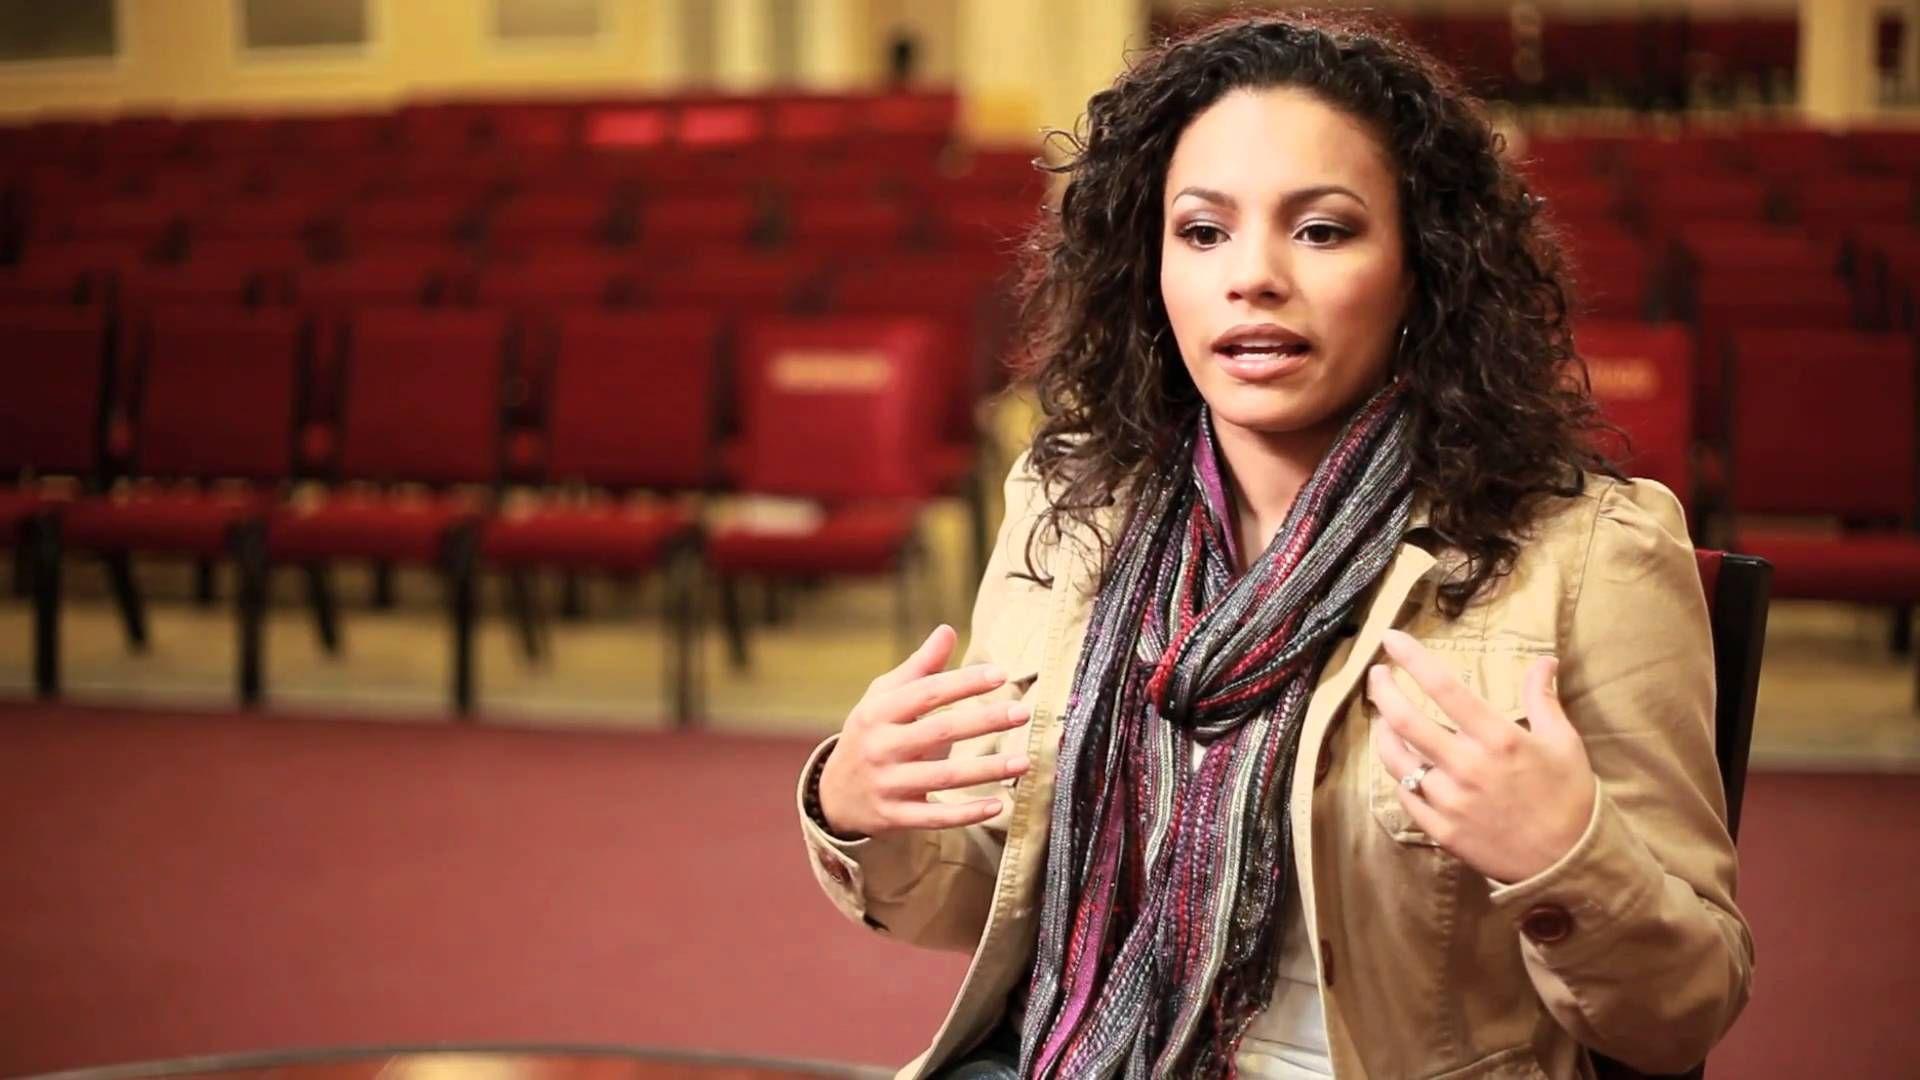 Joan Barry (American actress) Adult videos Inez Clough,Shabnam Moghaddamy